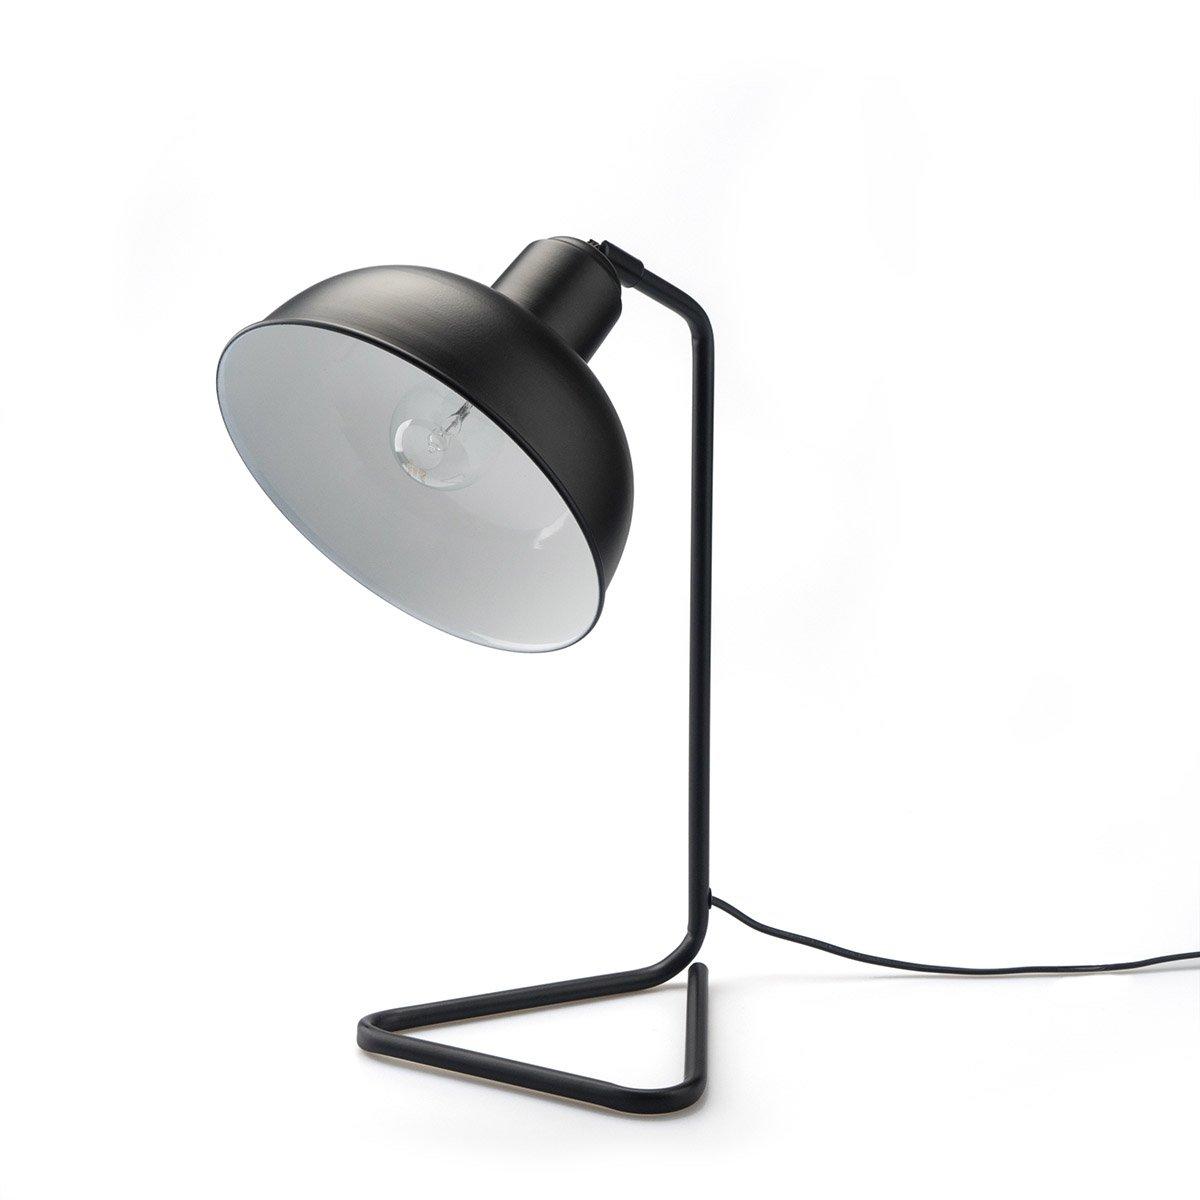 Black Velvet Studio Lampada da tavolo Pixar metallo, color nero, stile retrò, 26x19x41 cm. Black Velvet Studio S.L.U.